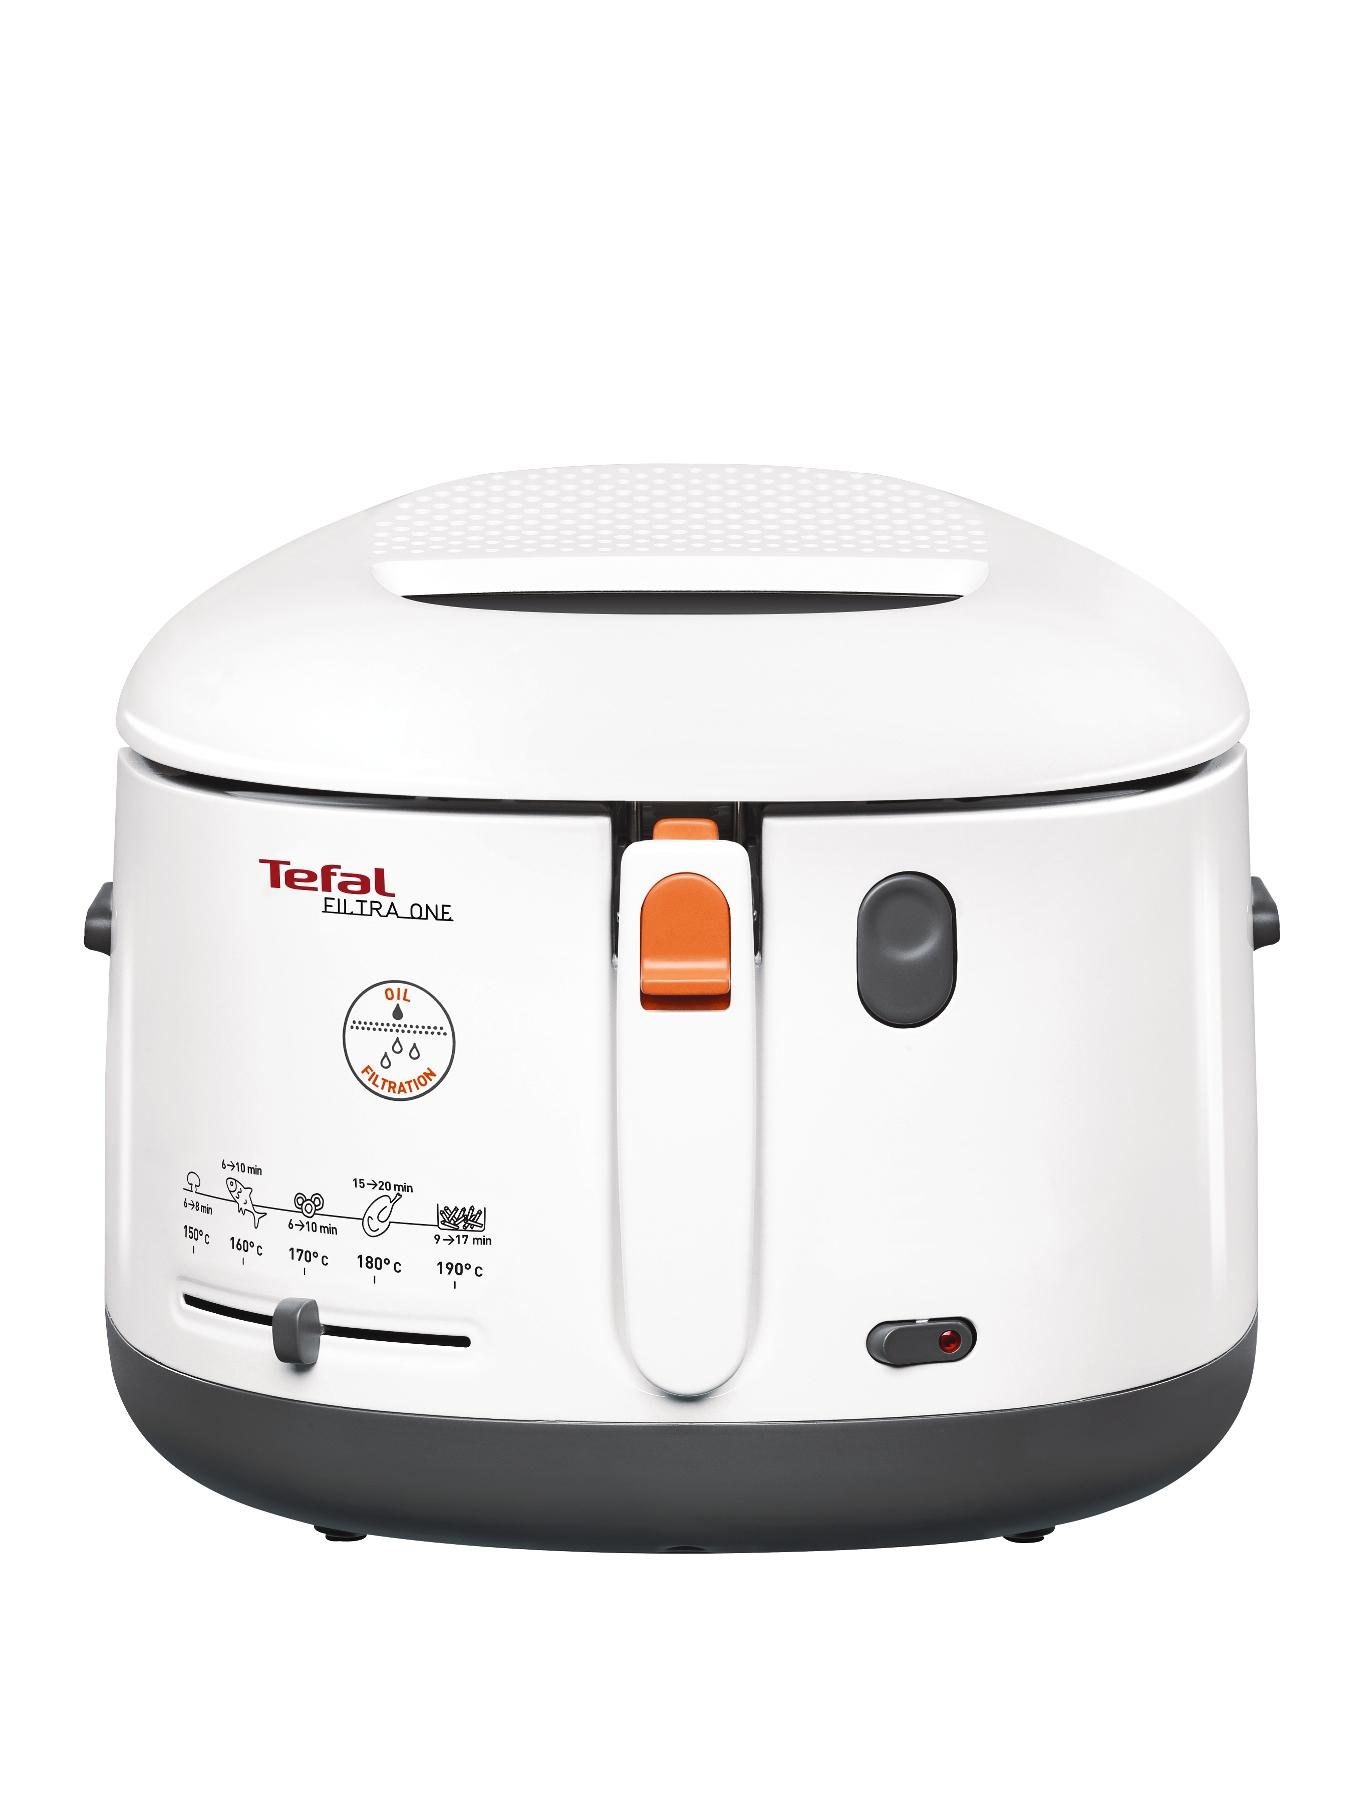 Tefal F52-1 Filtra One Fryer